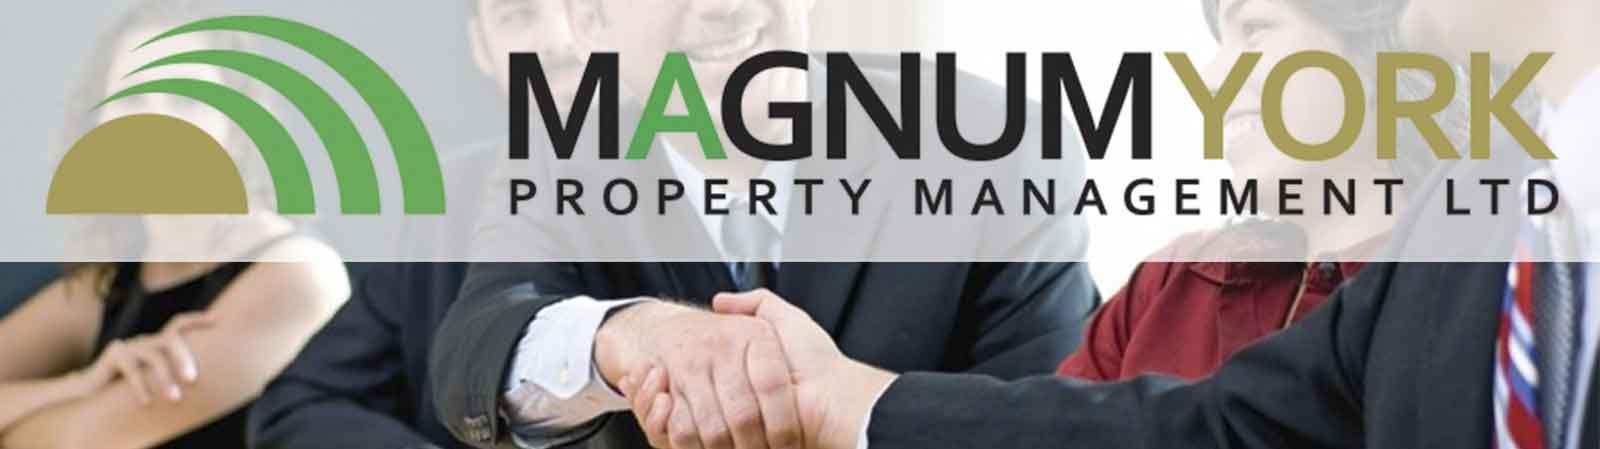 condo board members magnum york ltd blog resolutions solutions handshake people property management